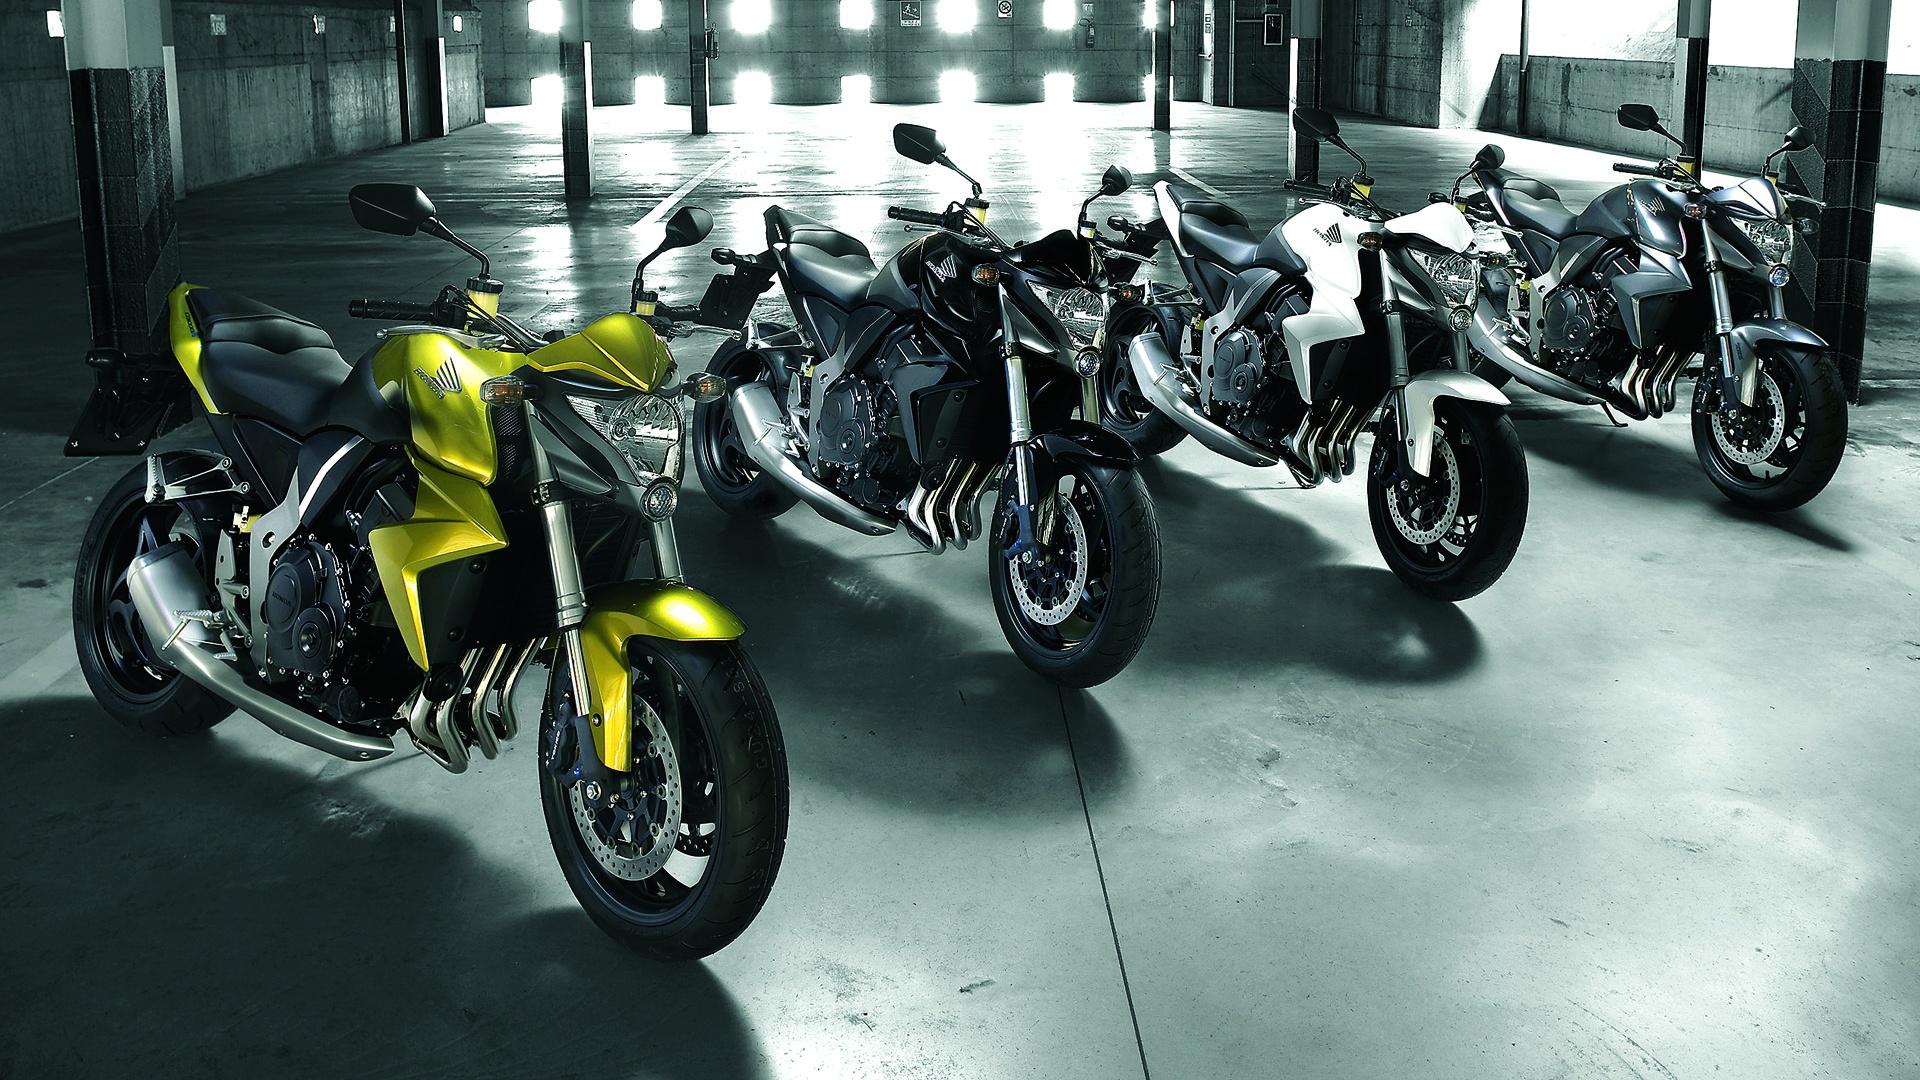 honda_bikes-hd motorcycle wallpaper